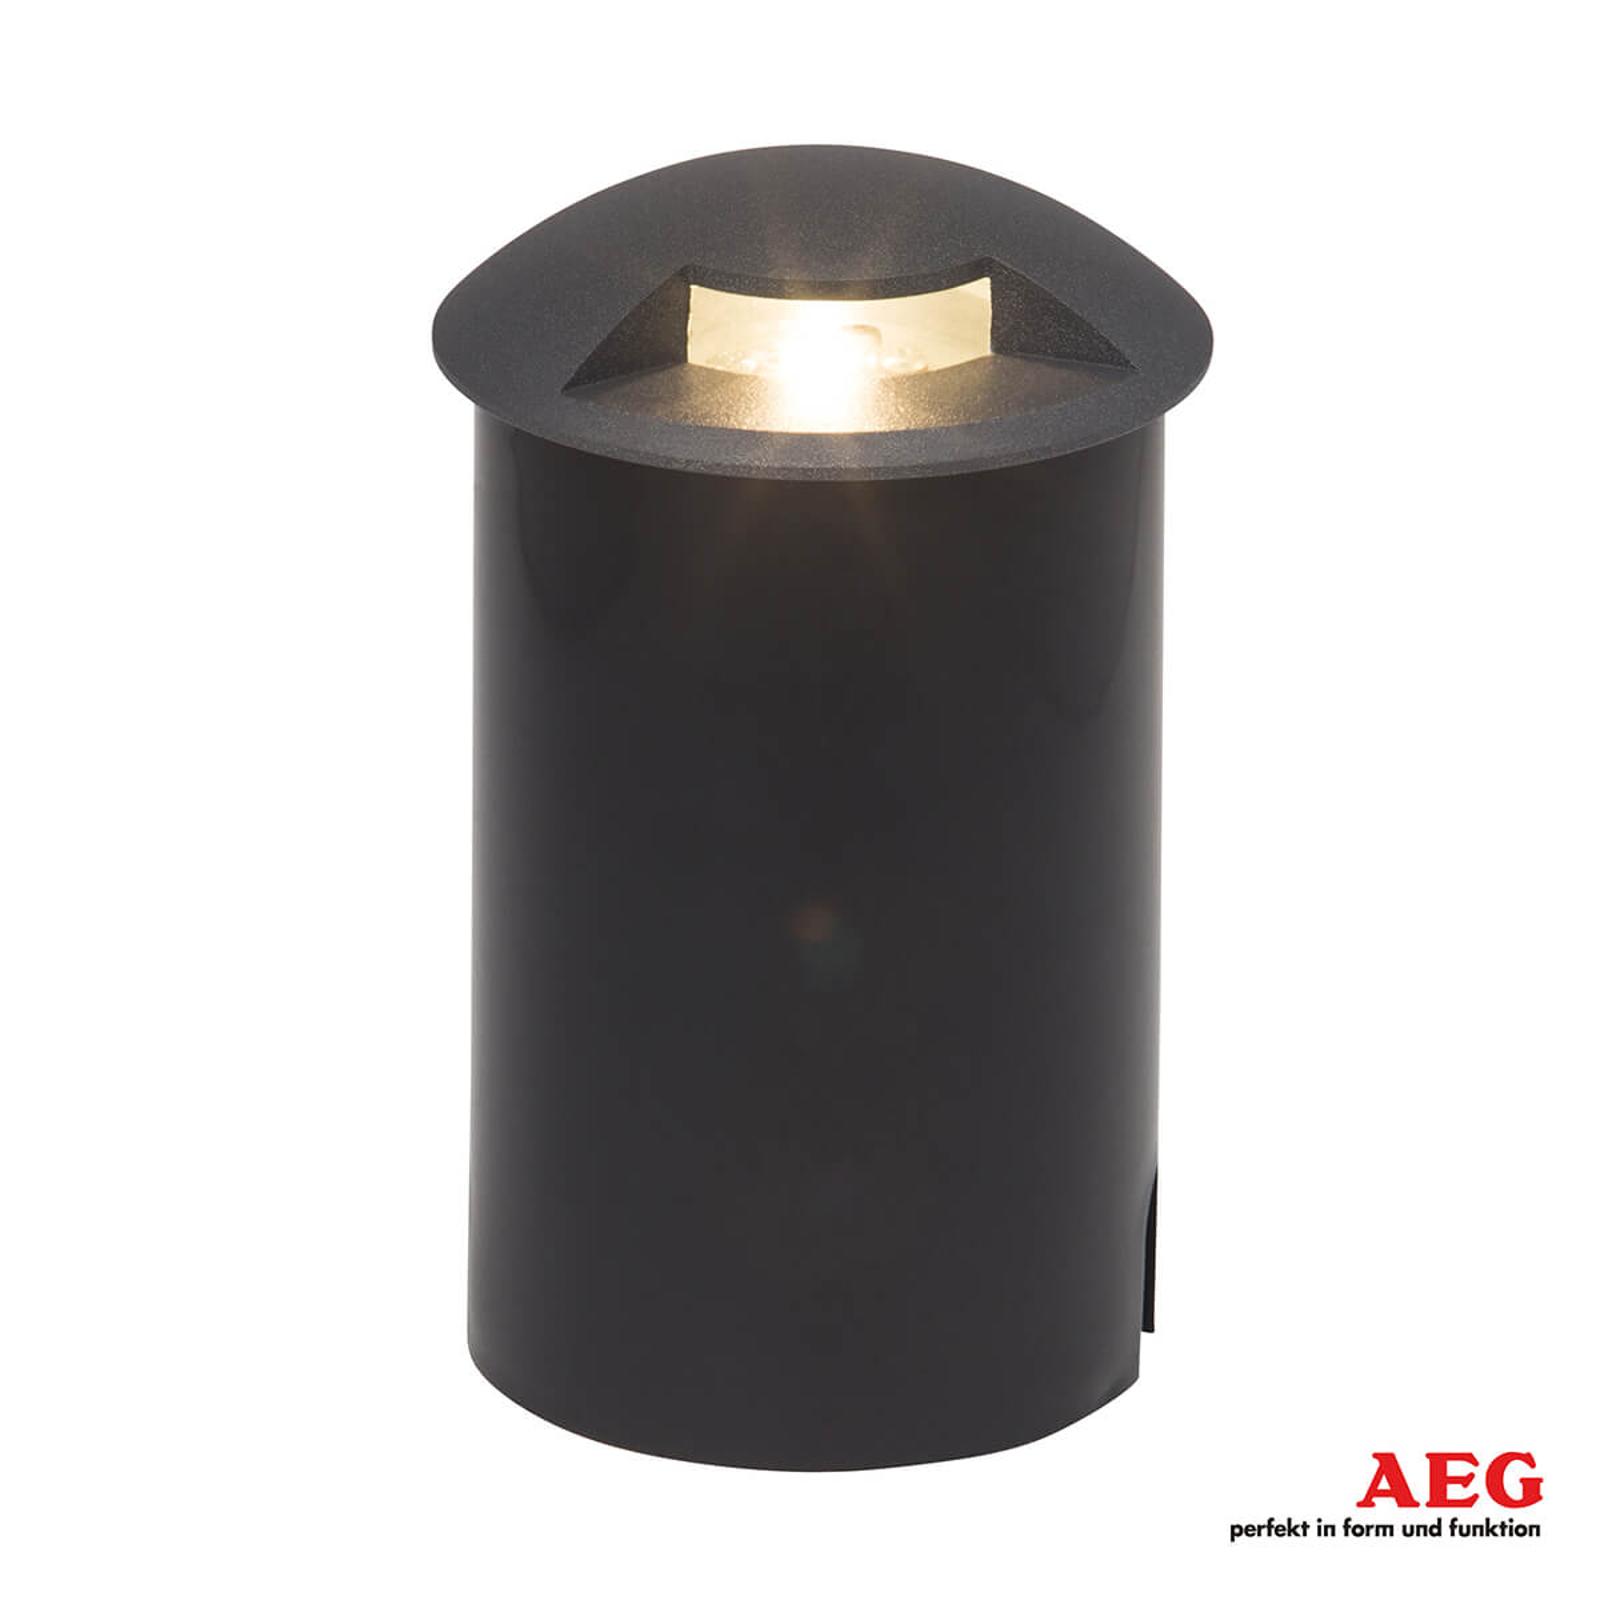 AEG Tritax - LED grondspot inbouwlamp, enkelzijdig